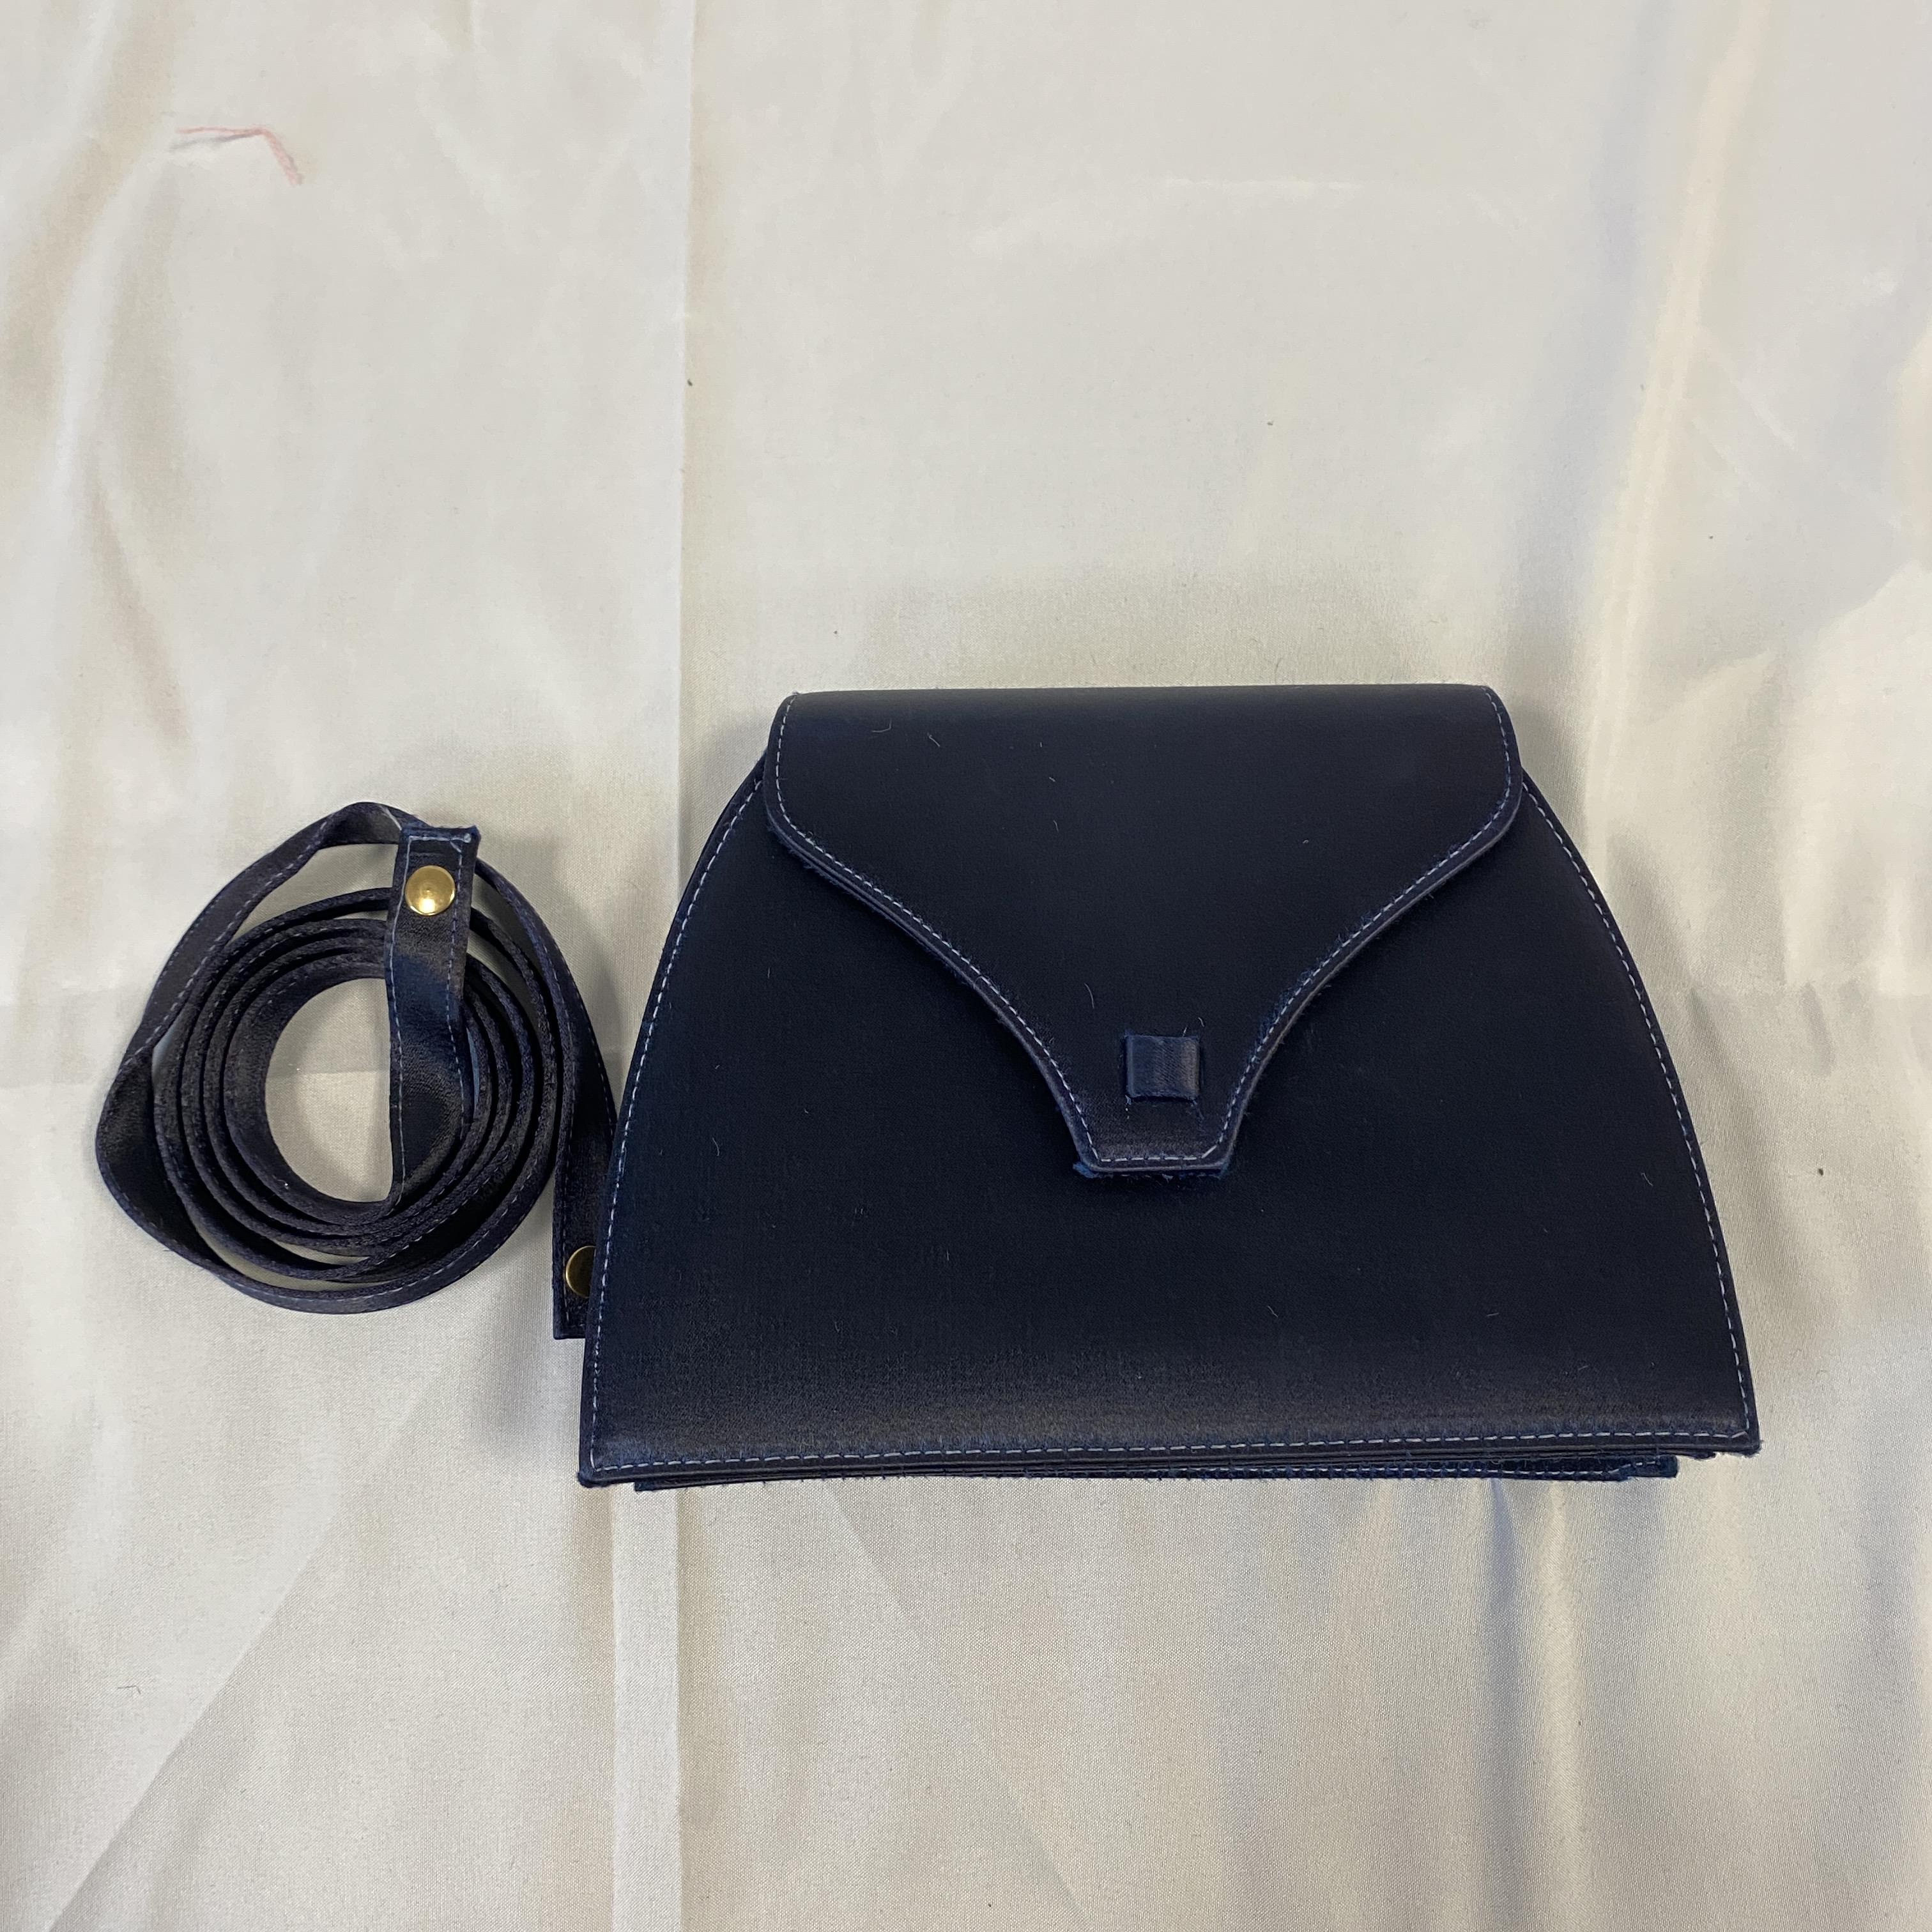 Ivory Bond Street Navy Clutch Bag